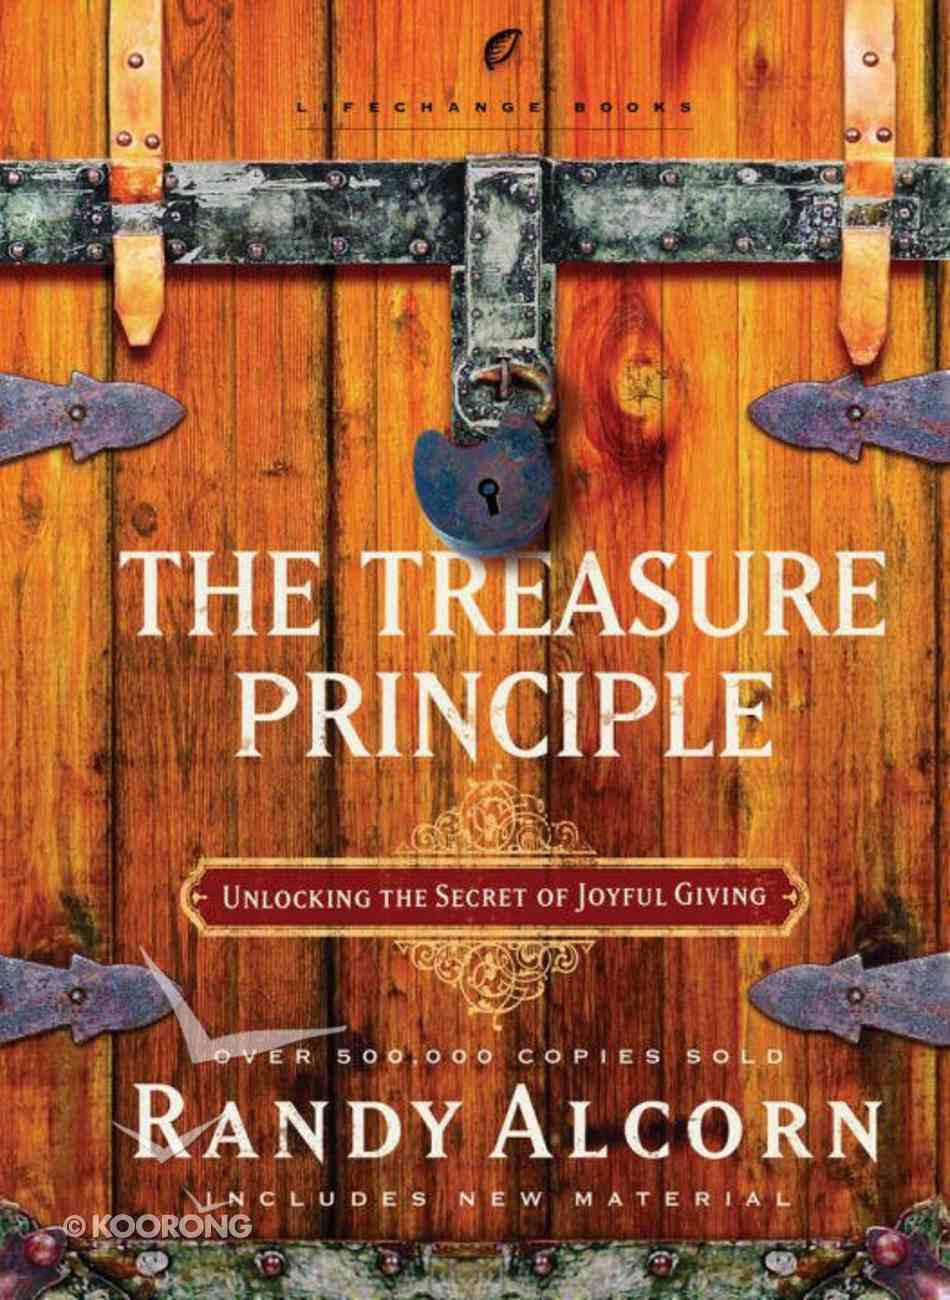 The Treasure Principle (Lifechange Books Series) eBook